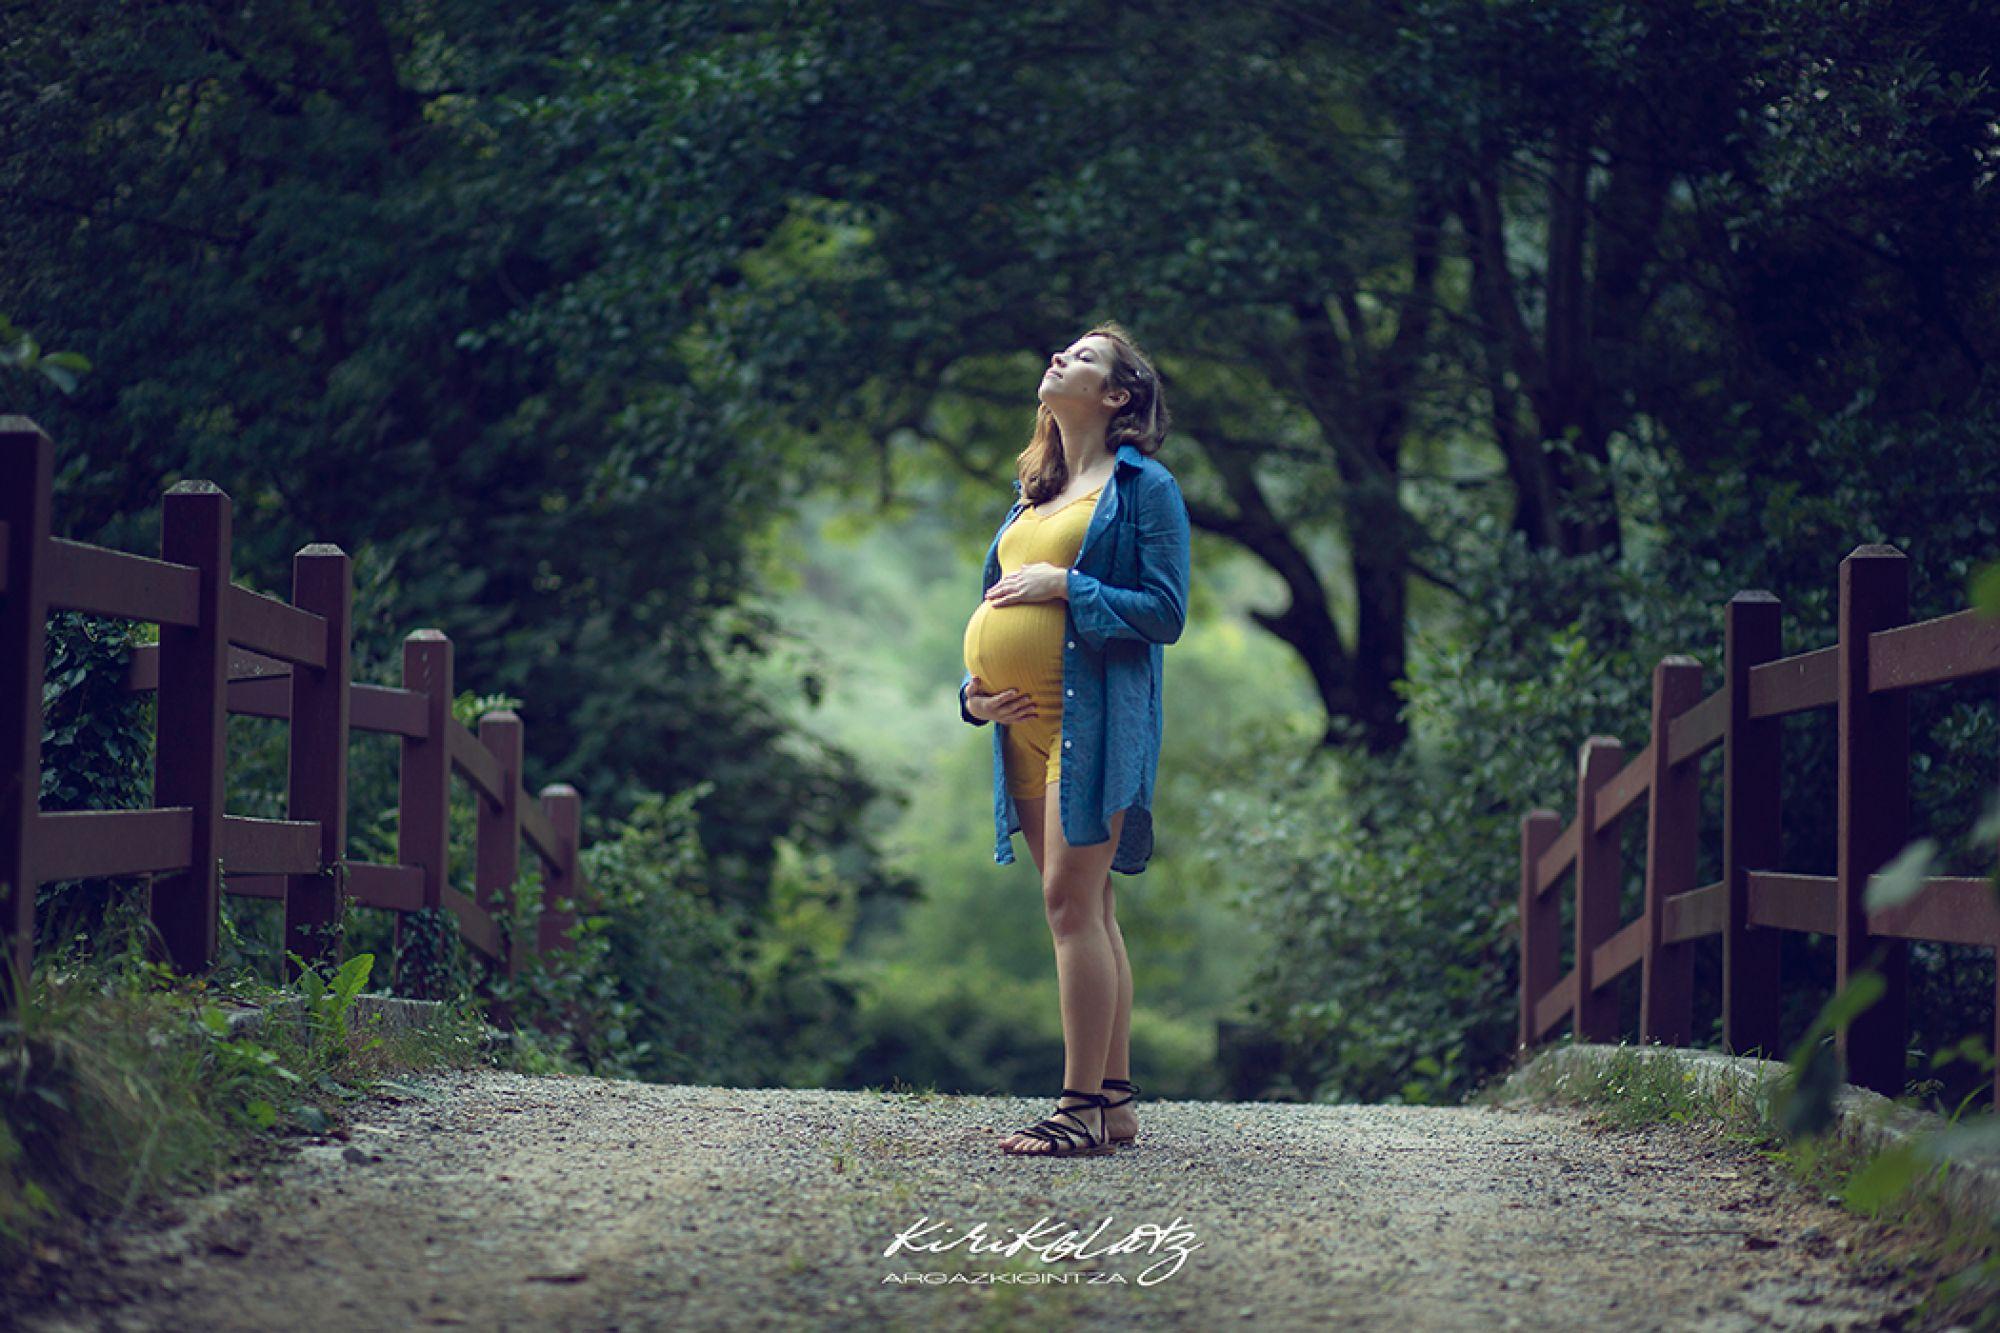 Fotos de embarazada, sesión exteriores en Urdaibai